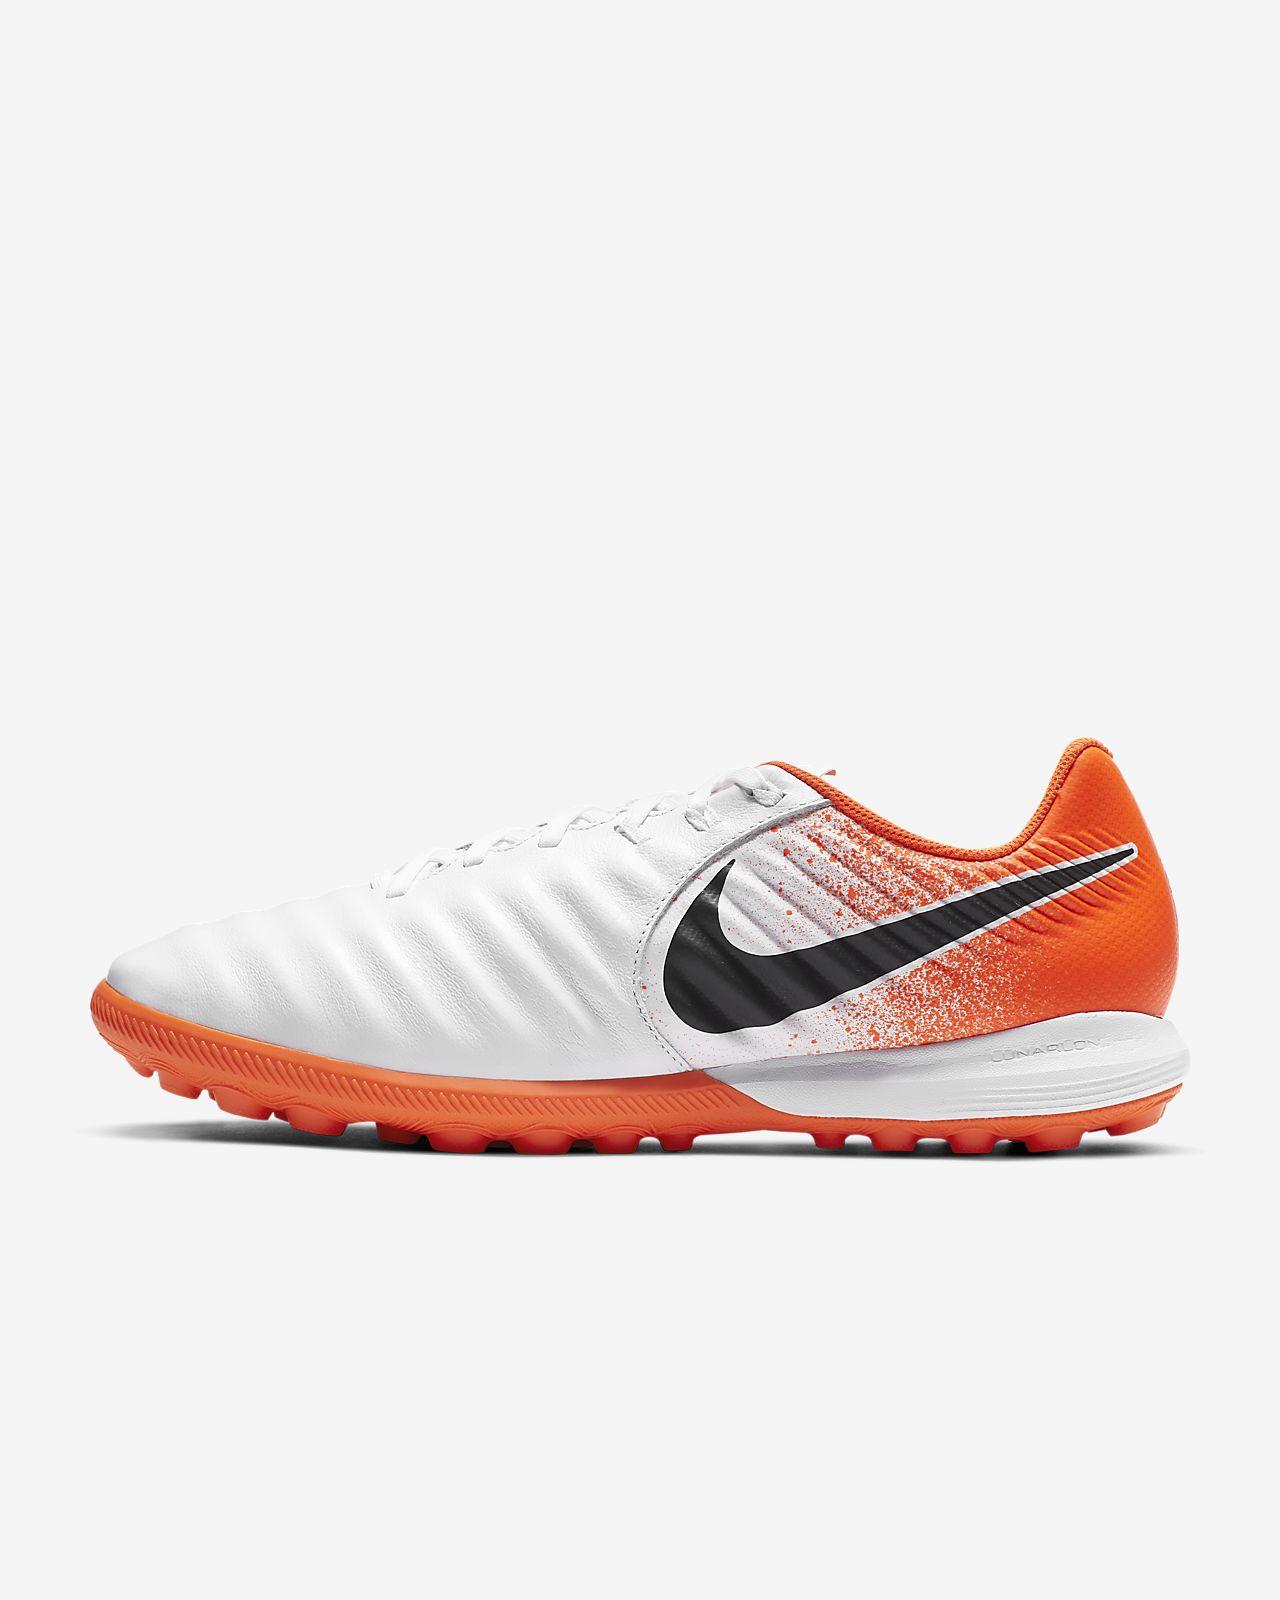 Fotbollssko för grus/turf Nike TiempoX Lunar Legend VII Pro